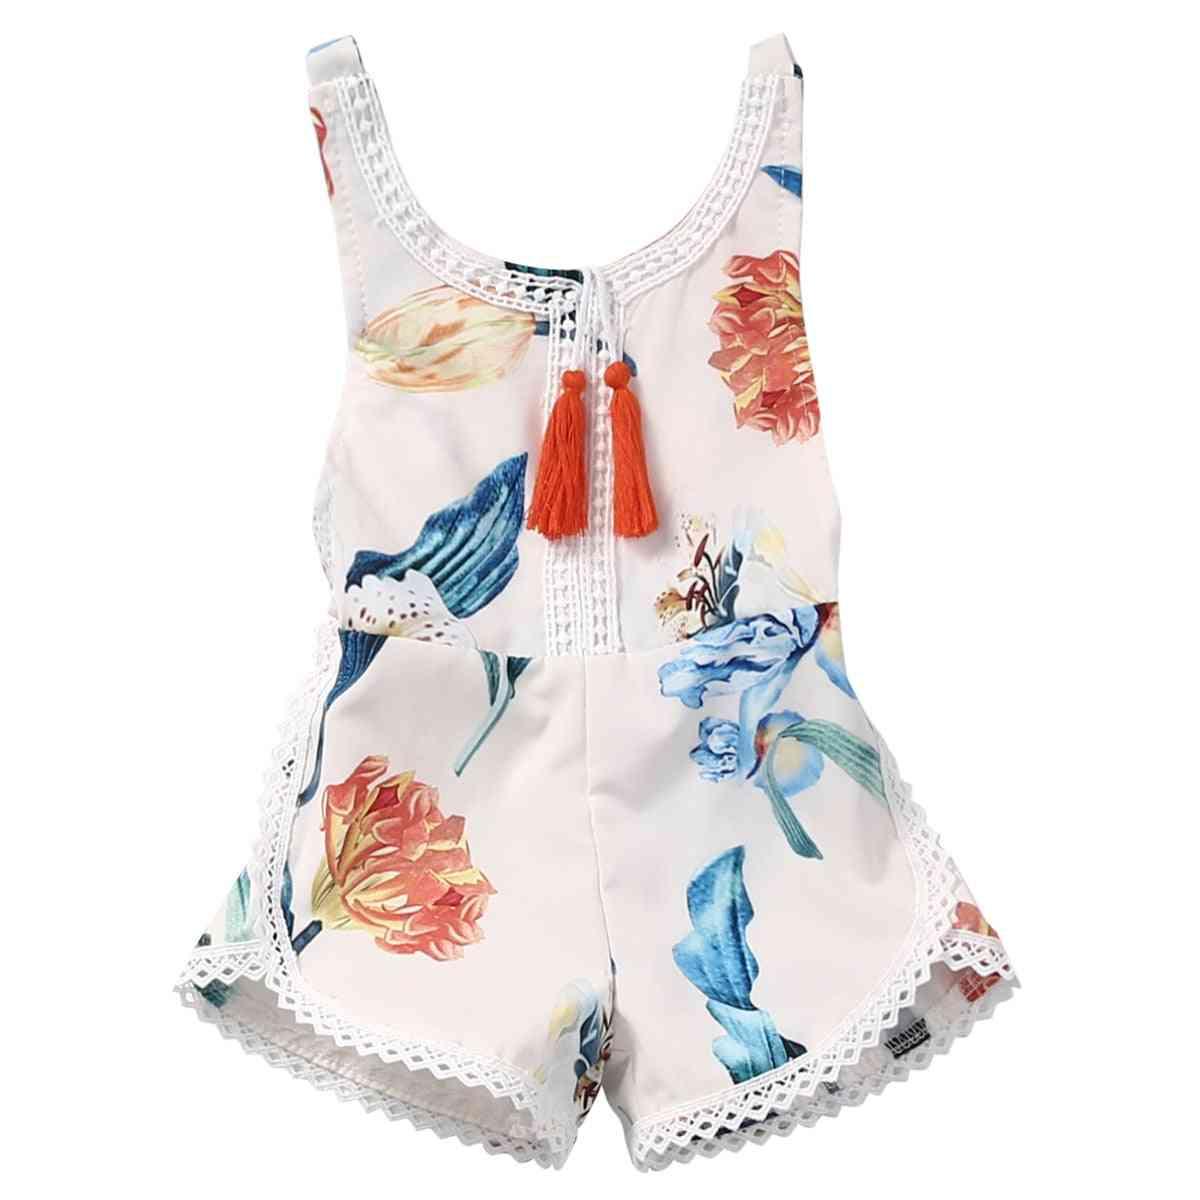 Girls Summer Clothing, Bib Overalls Jumpsuits Flower Print